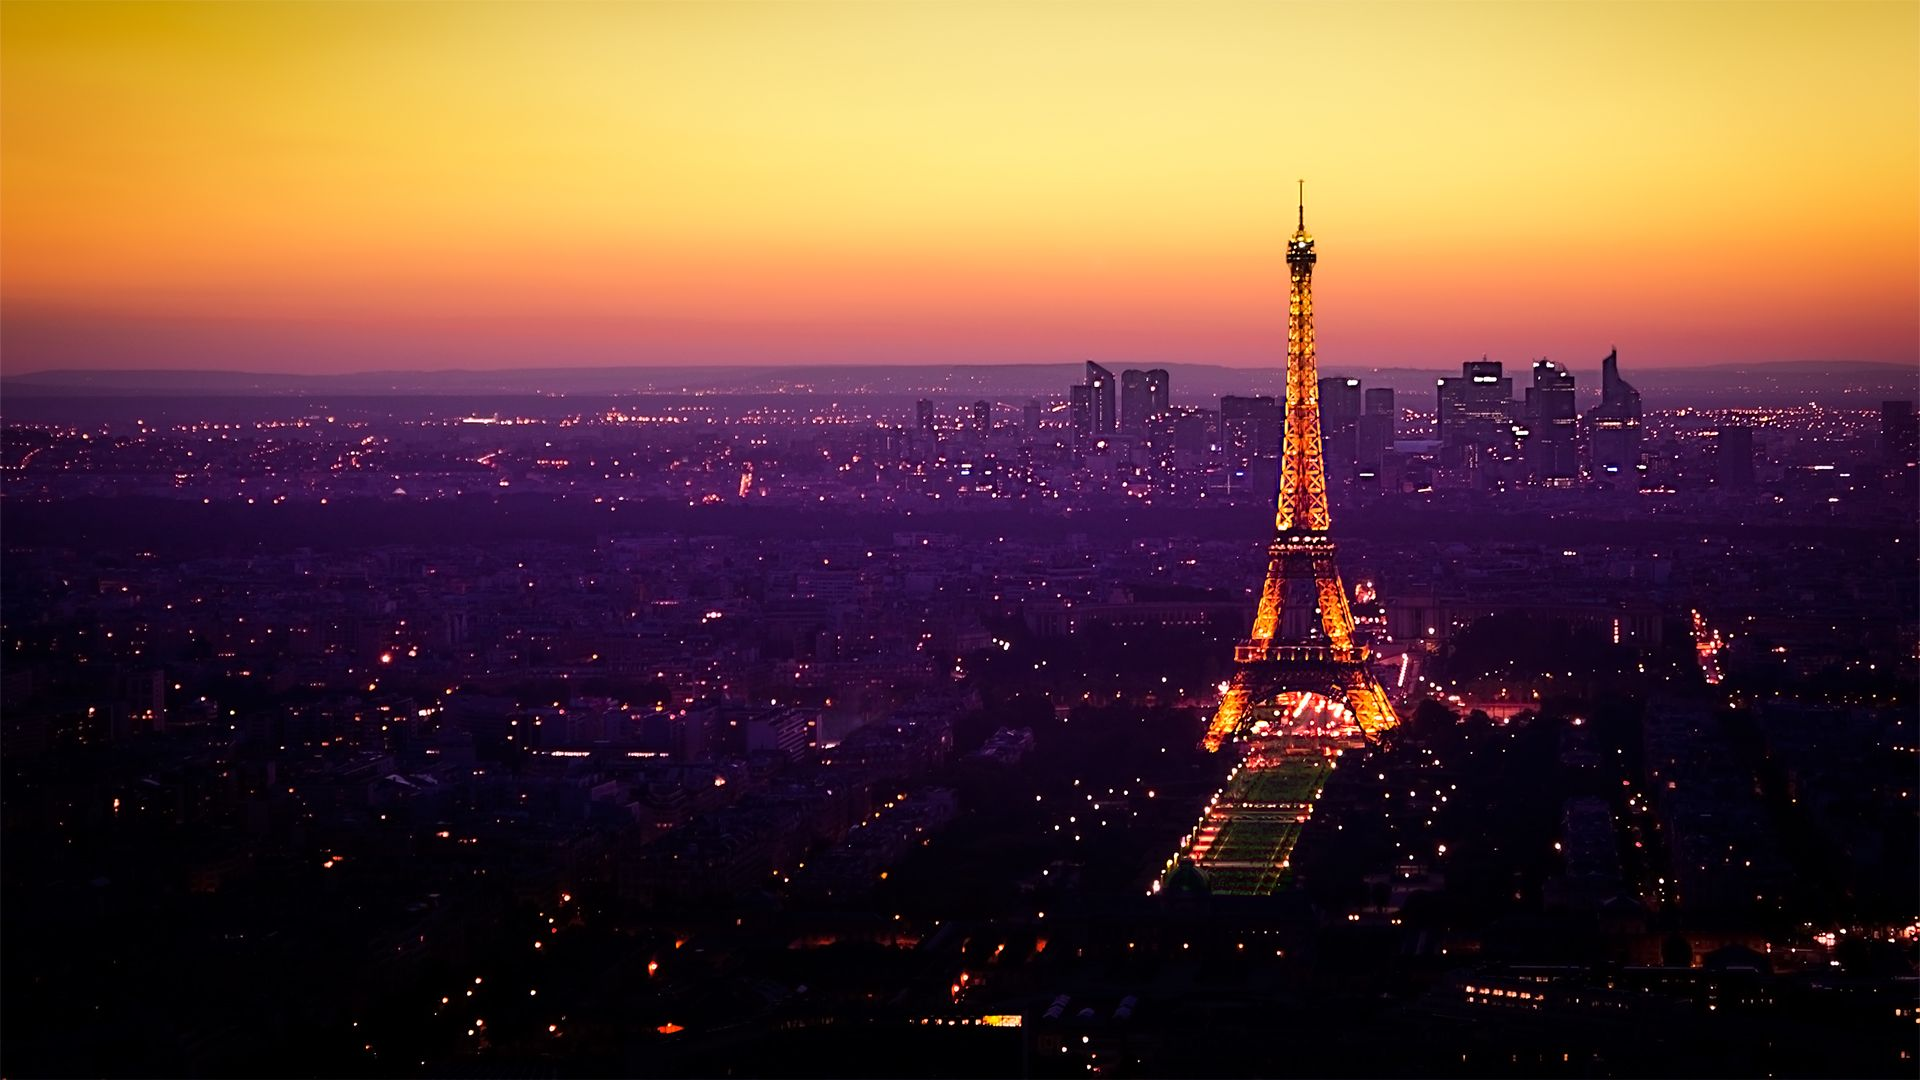 Paris At Night Wallpapers Top Free Paris At Night Backgrounds